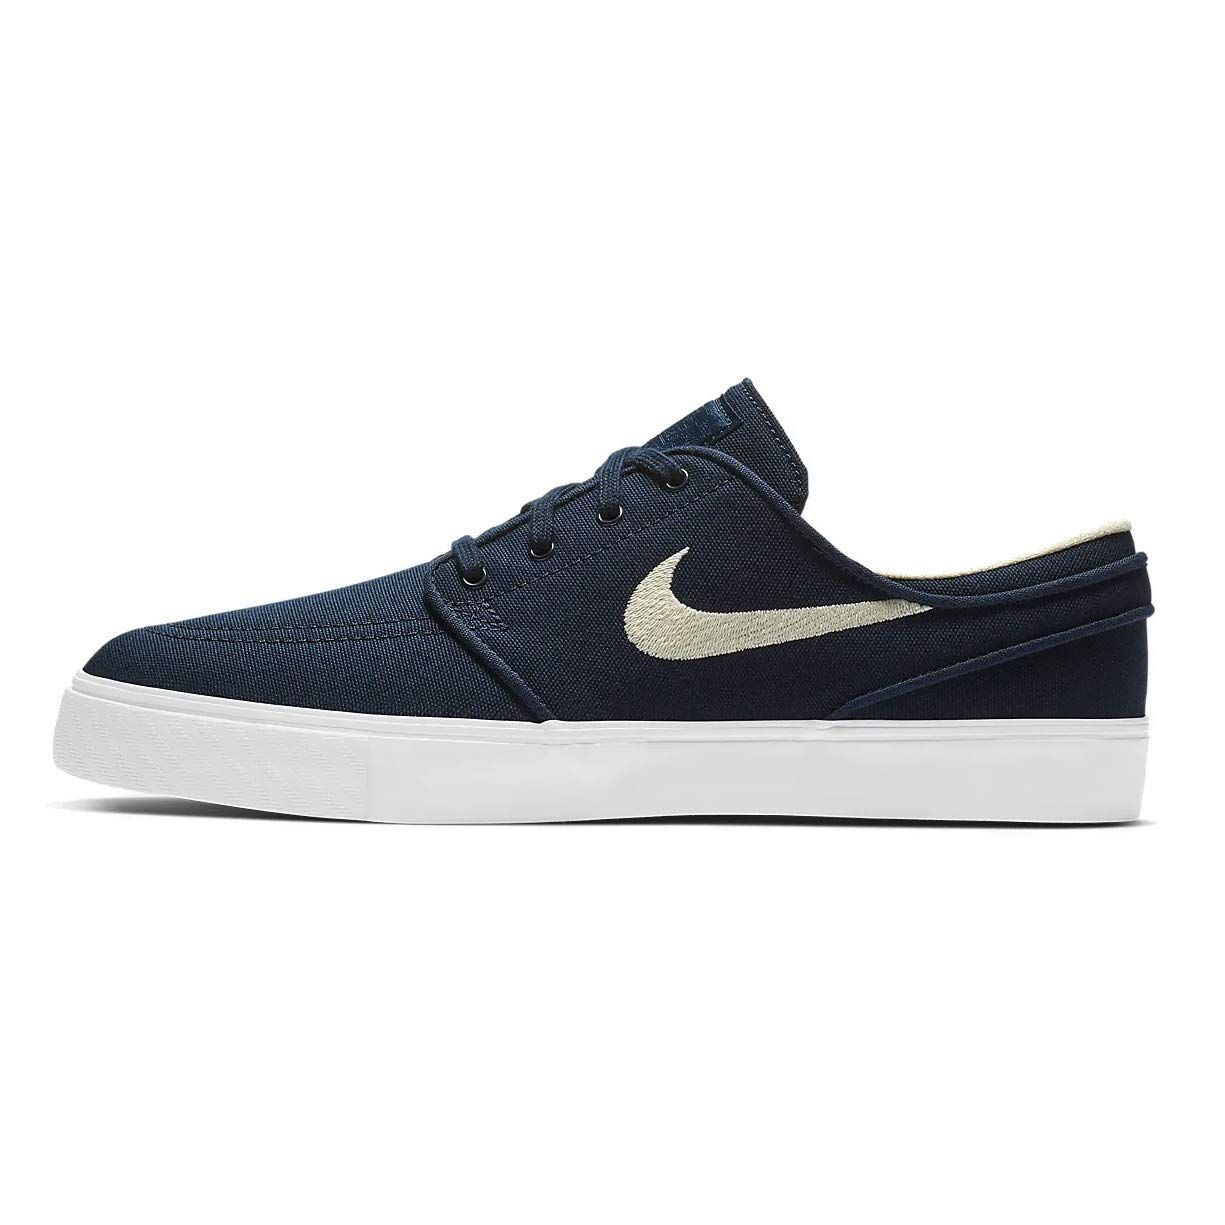 grand choix de 8cfa5 8925c Amazon.com | Nike SB Stefan Janoski Max | Shoes | Wish List ...